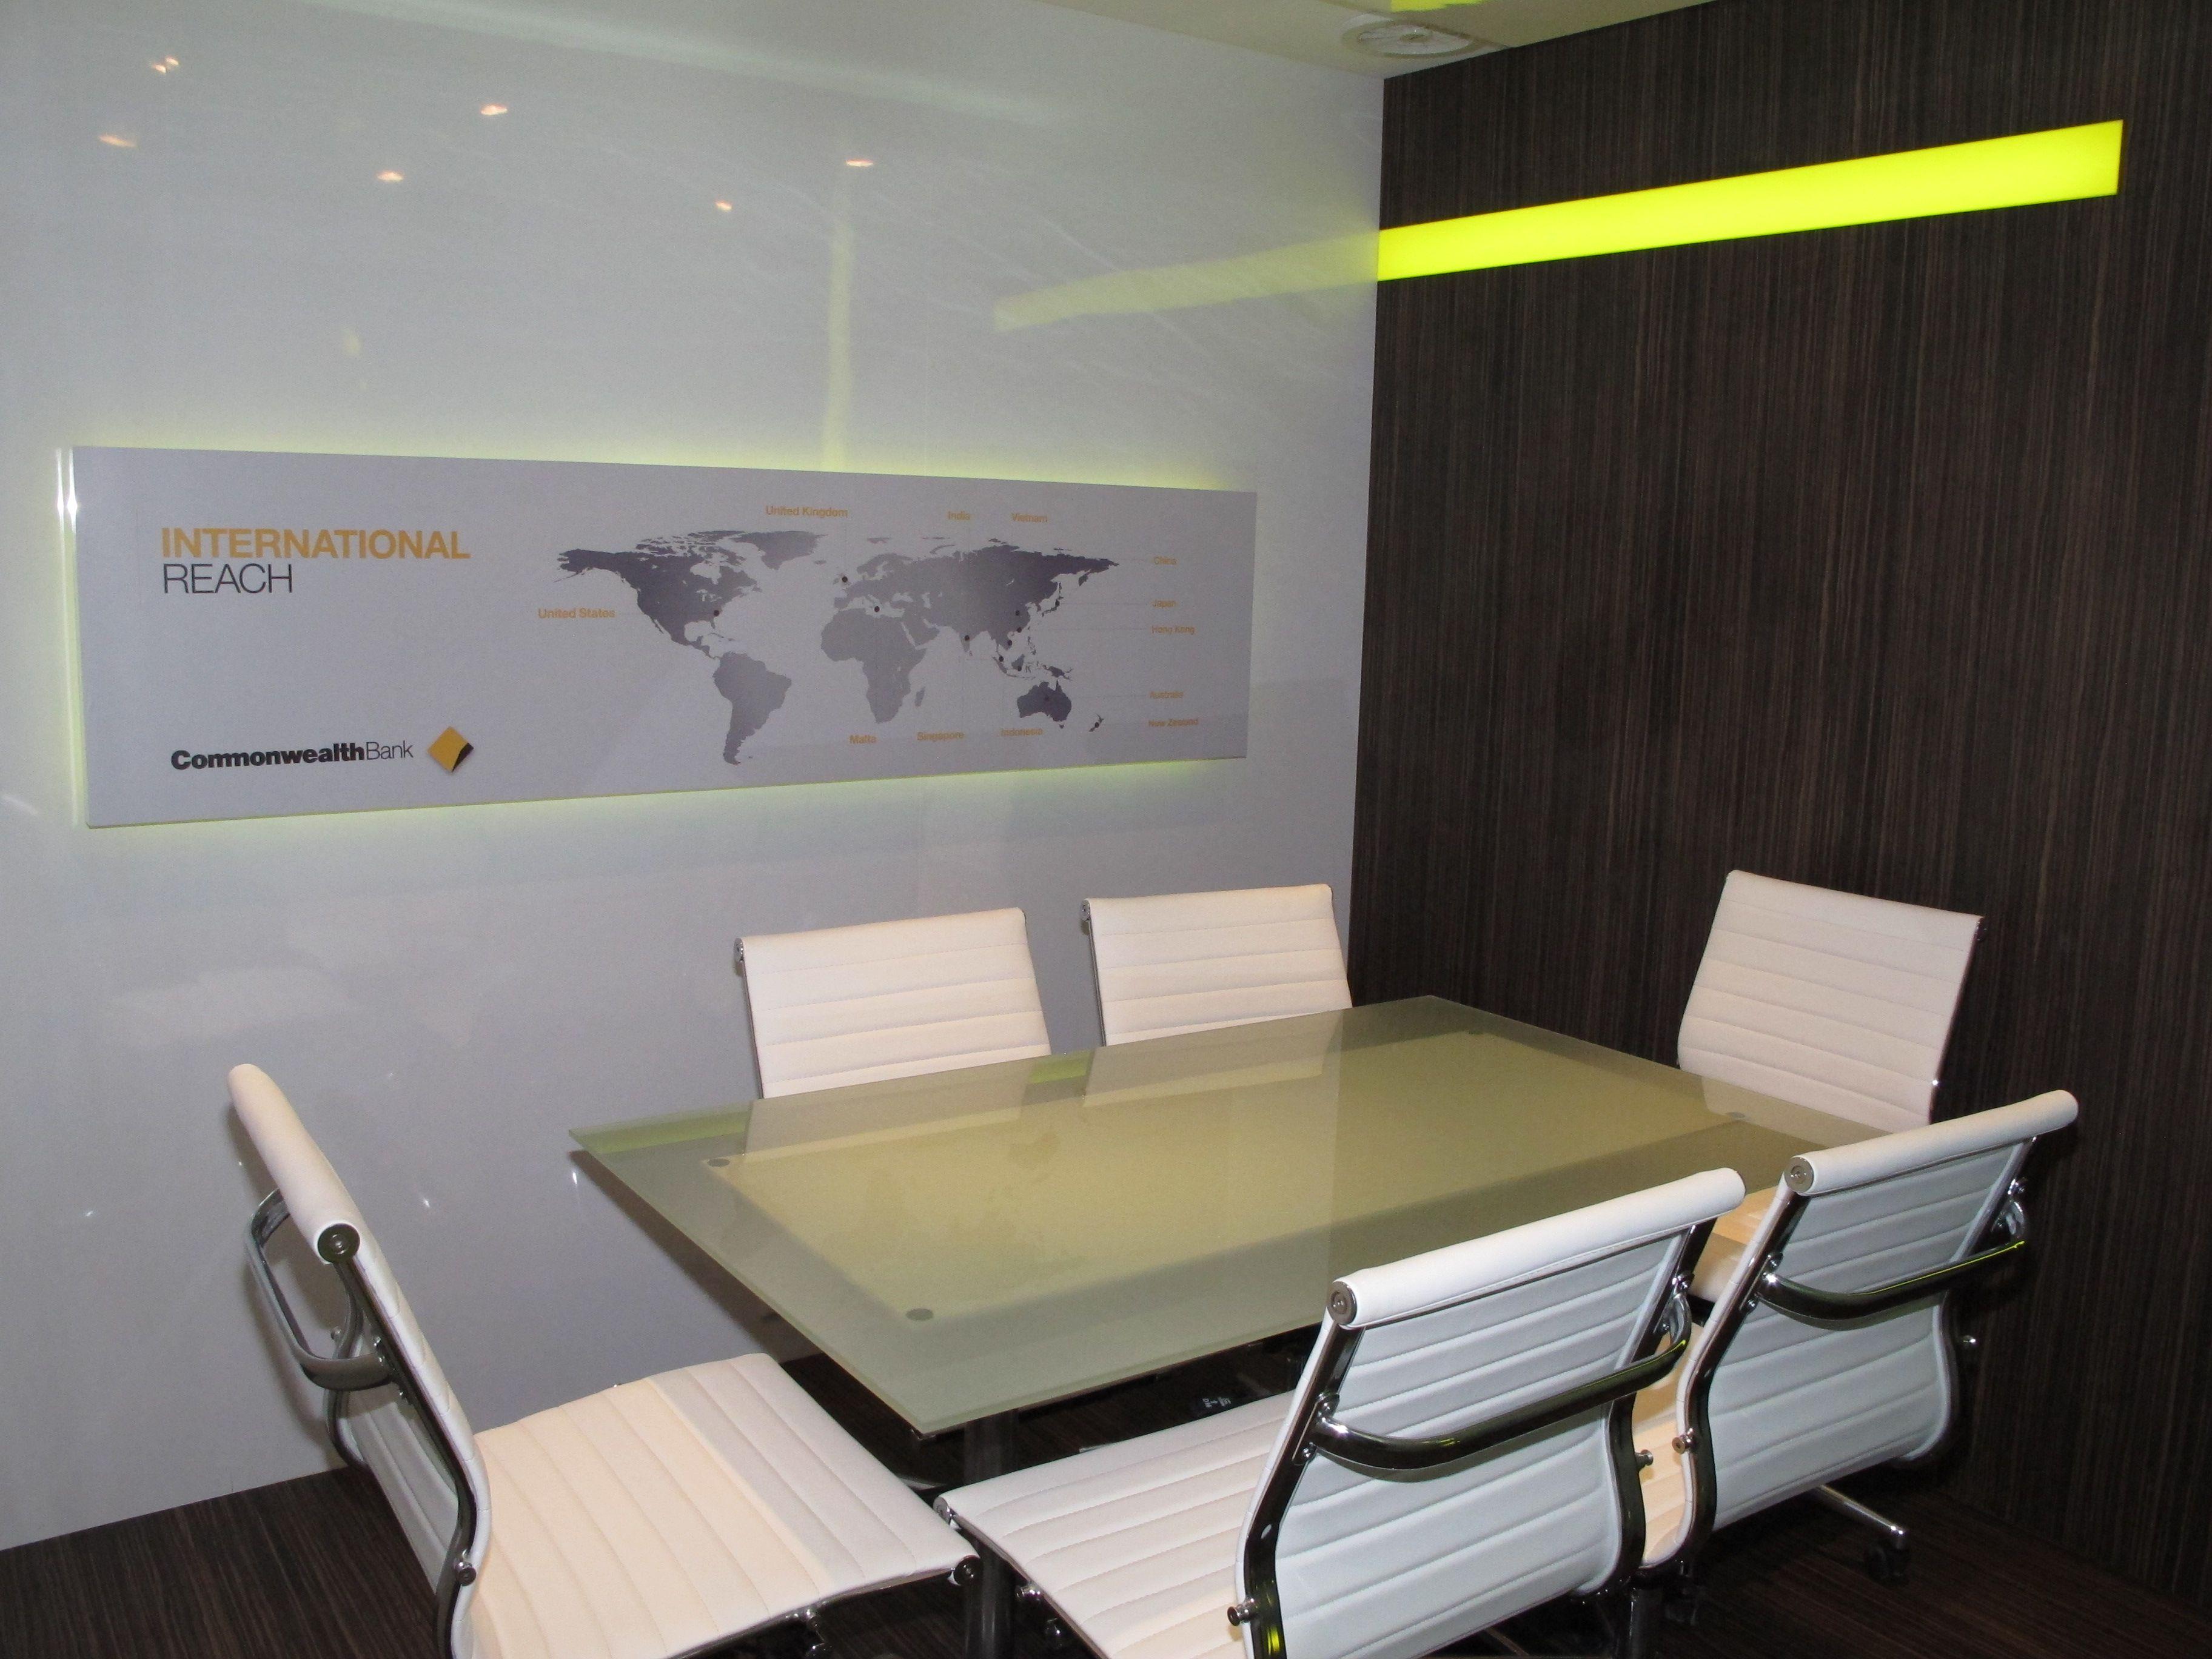 Sungard Exhibition Stand Design : Commonwealth bank of australia at sibos dubai